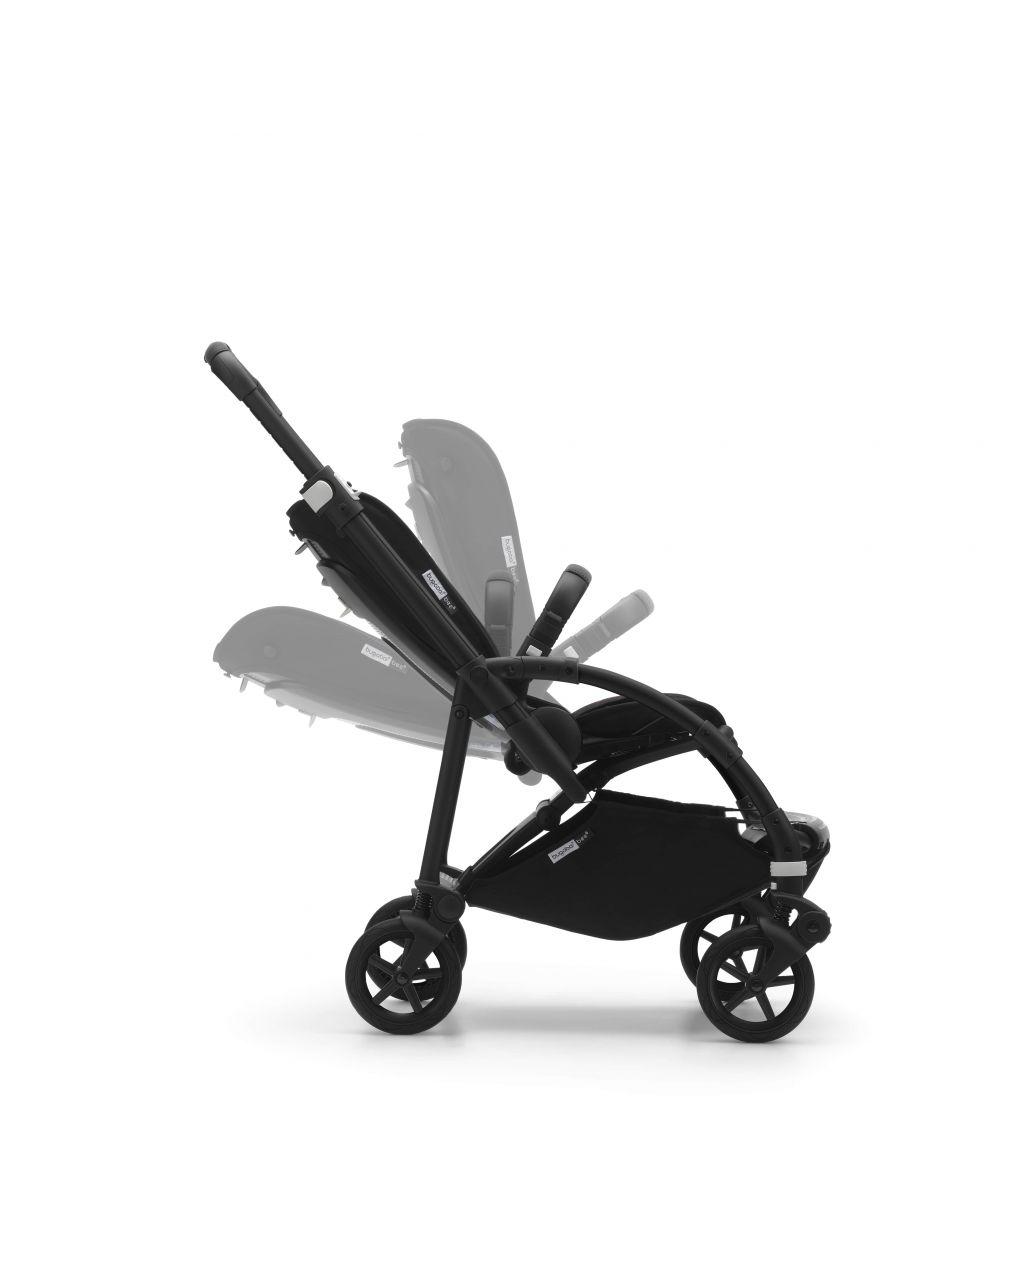 Bugaboo bee 6 completo alu/grigio - grigio melange - Bugaboo